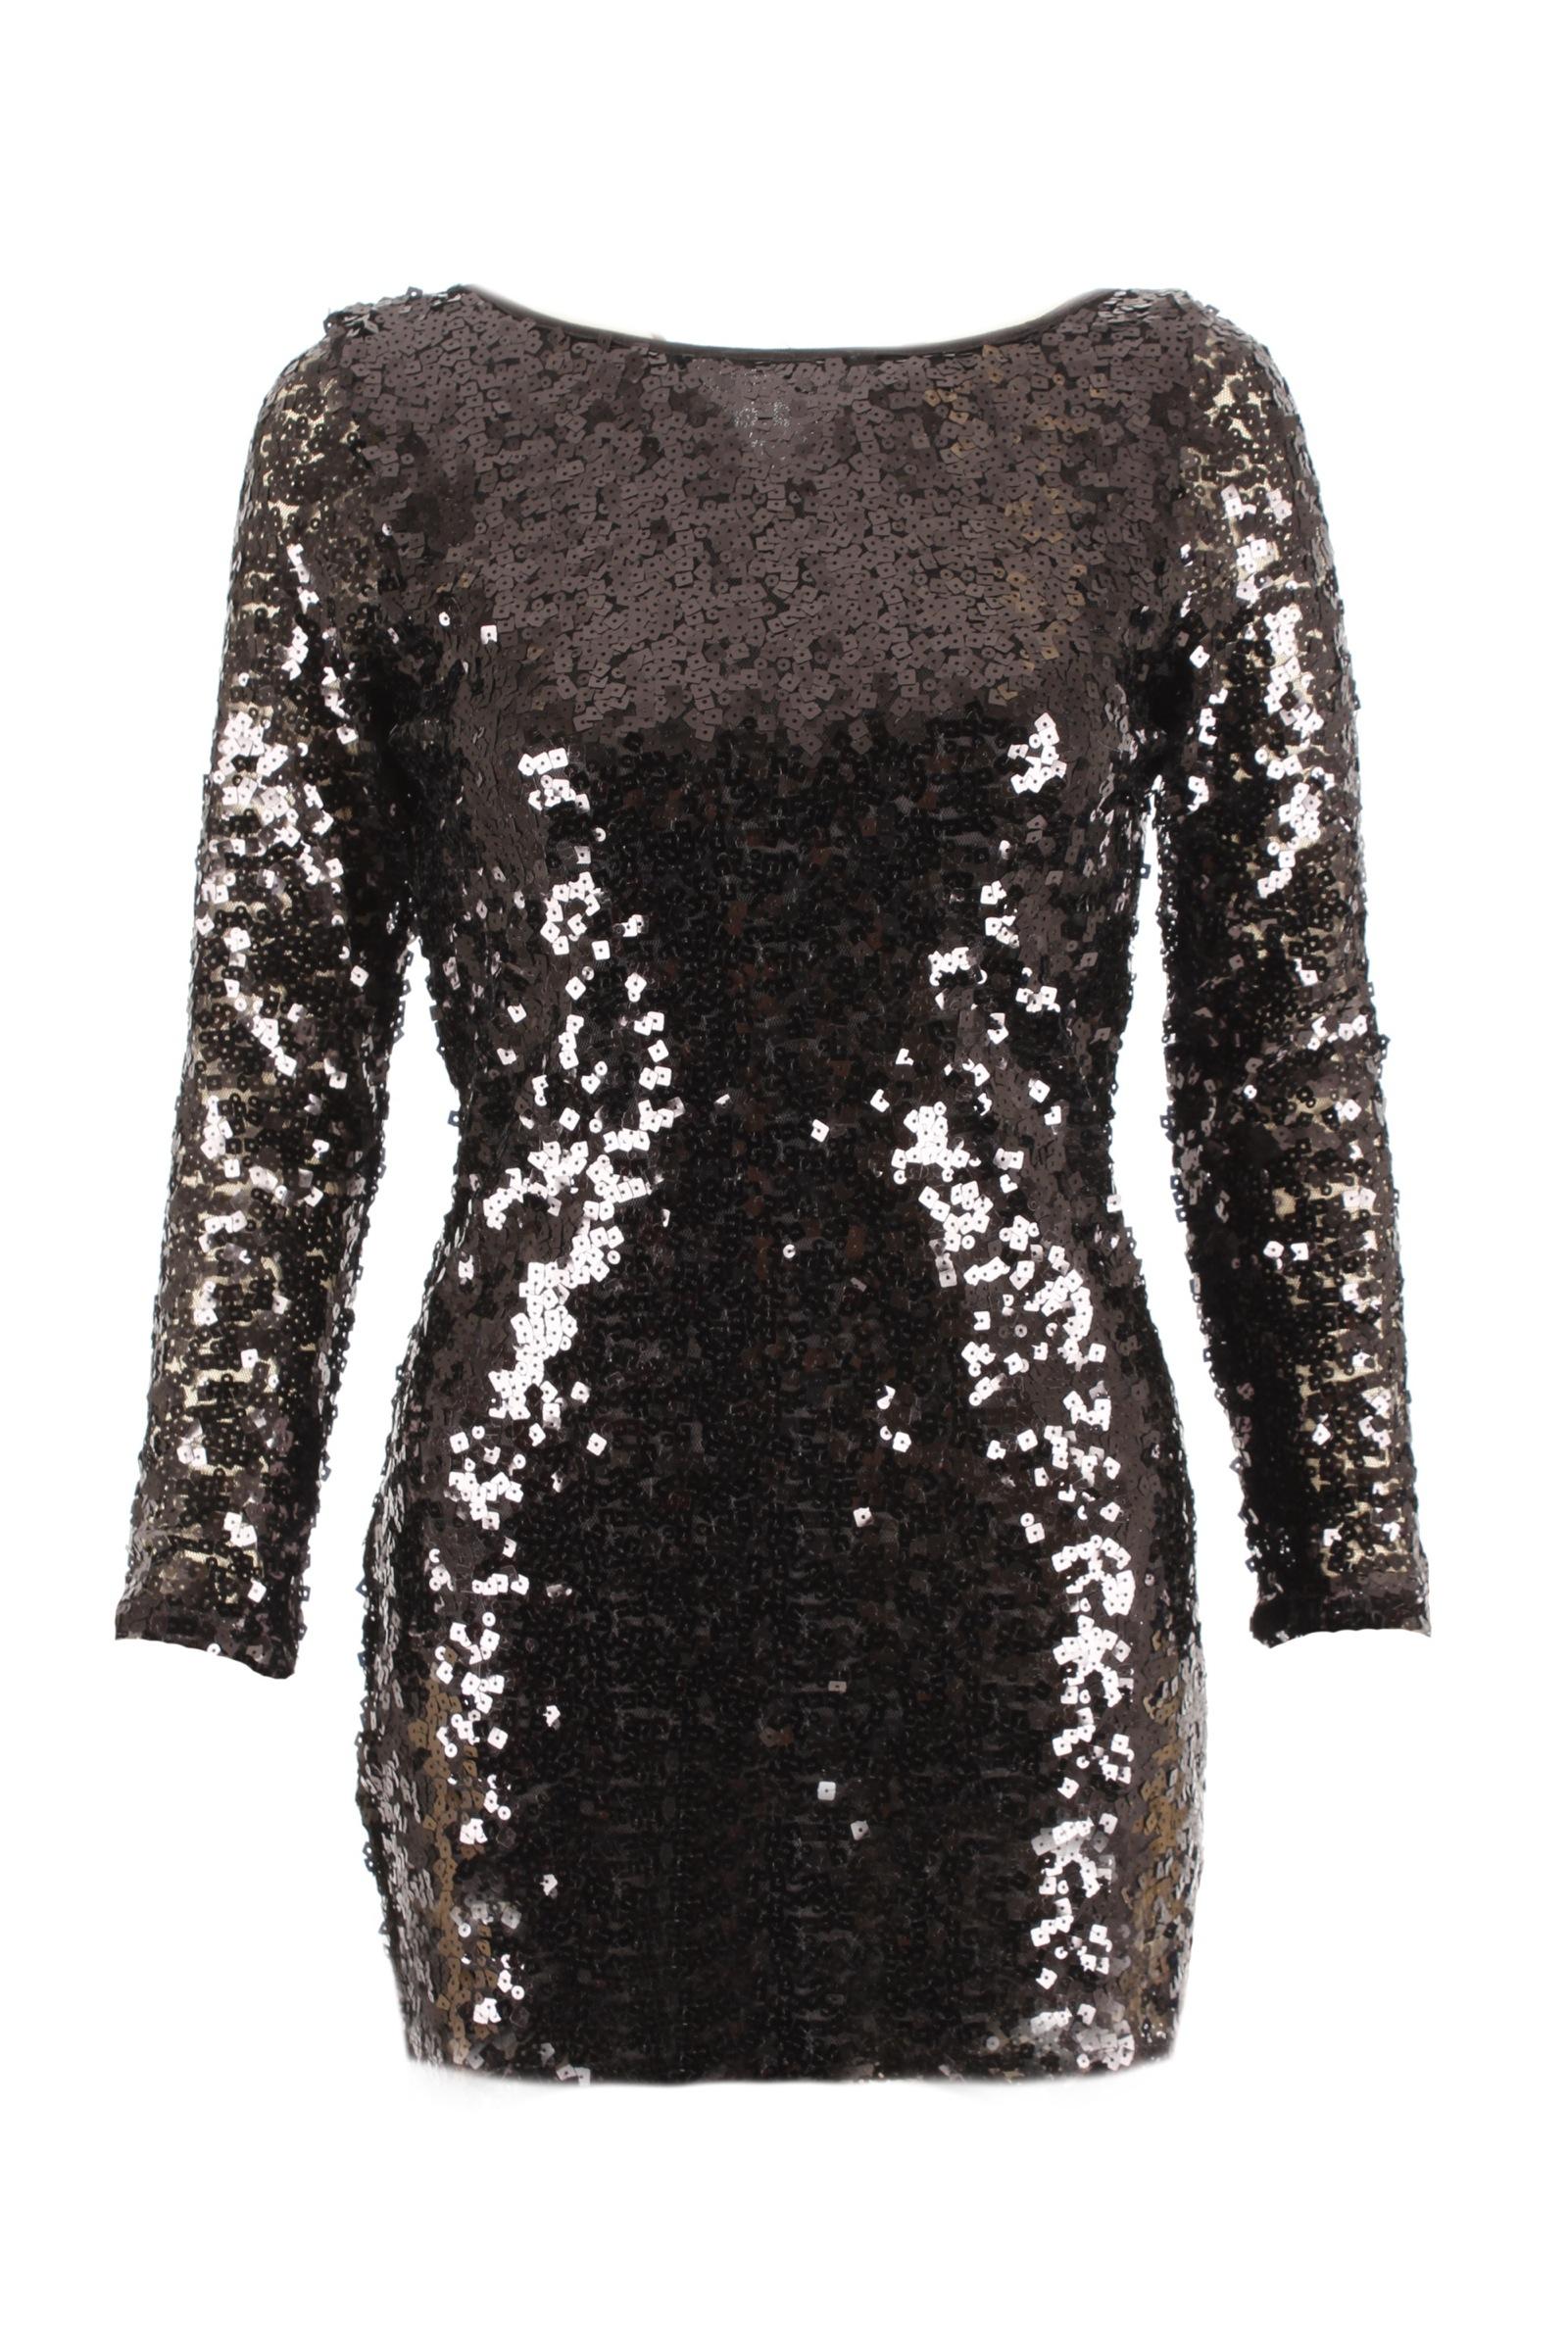 New Womens Long Sleeve Sequin Dress  eBay